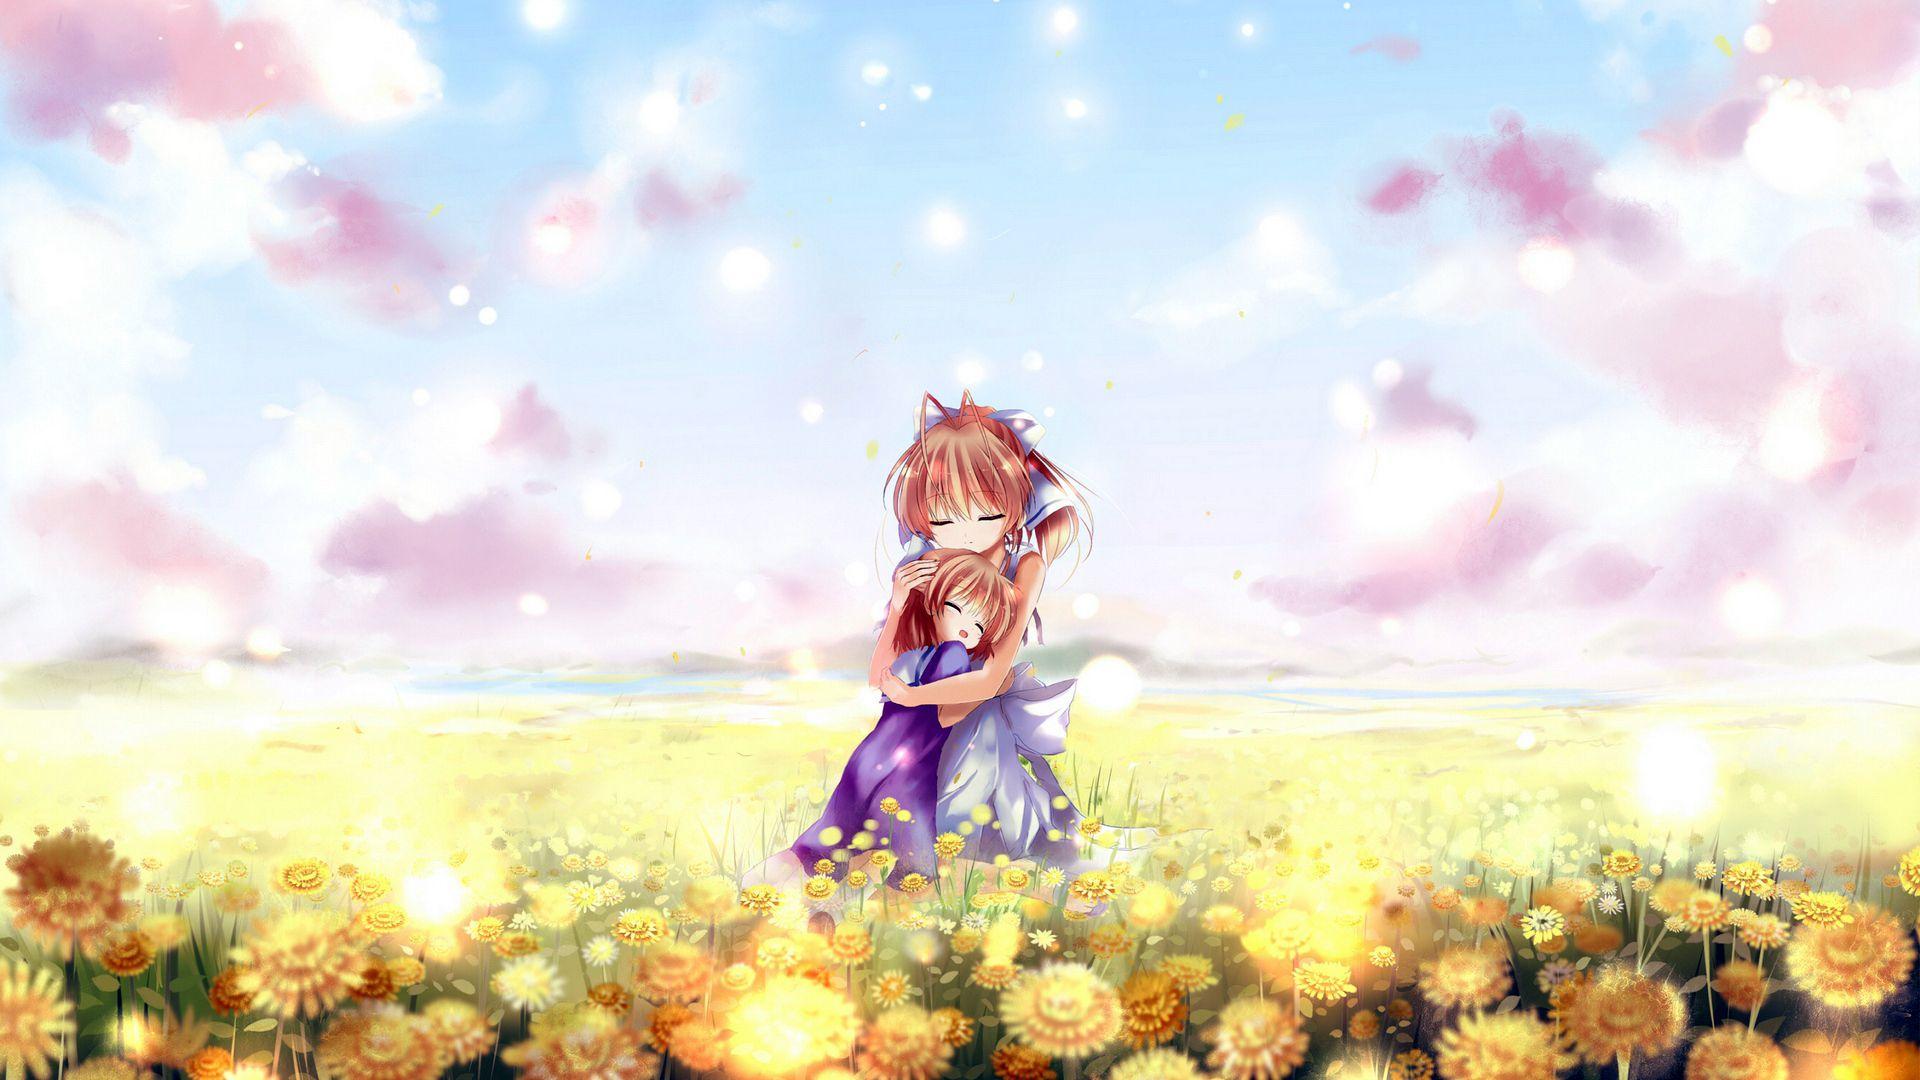 Anime Clannad Anime Females Sisters Field